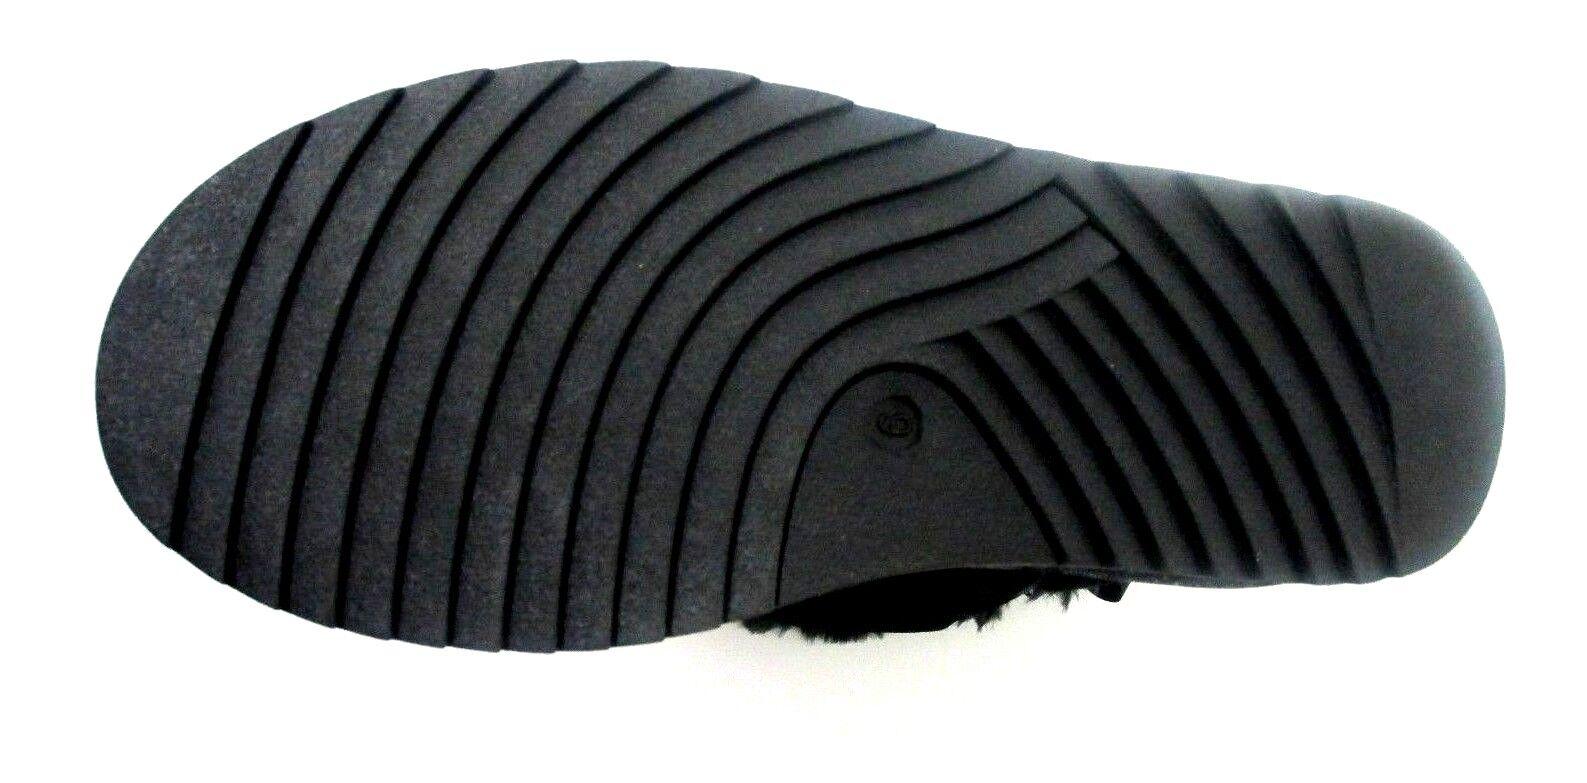 NEW WOMEN SO BRAND BRAND BRAND CLASSIC TOW BOWS BOOT  BLACK 3452 ORIGINAL 765217